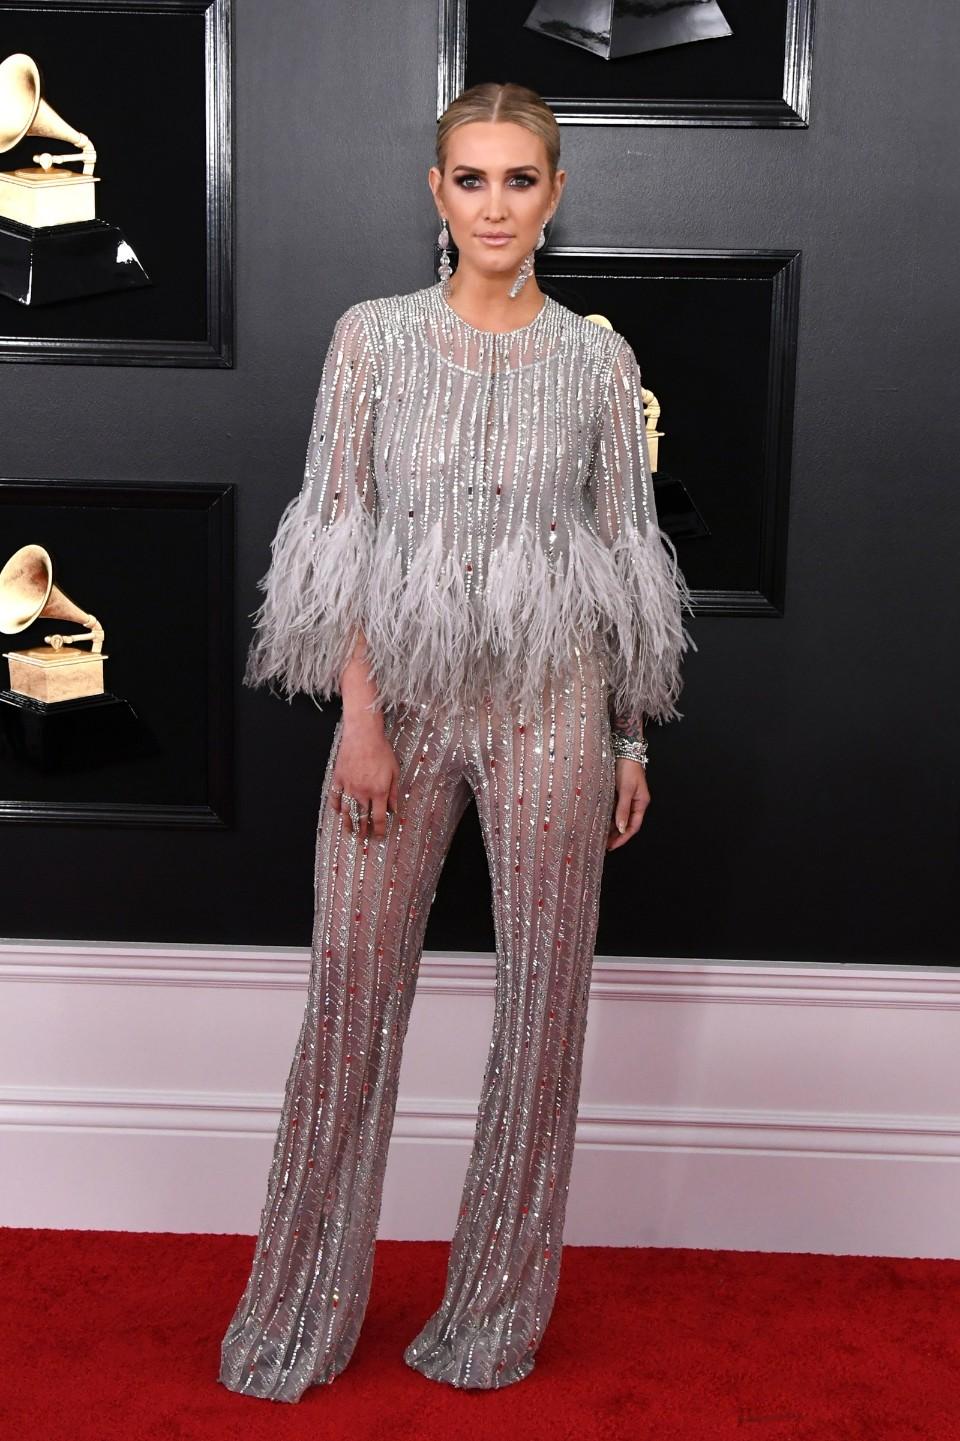 ashlee simpson grammy's 2019 fashion red carpet